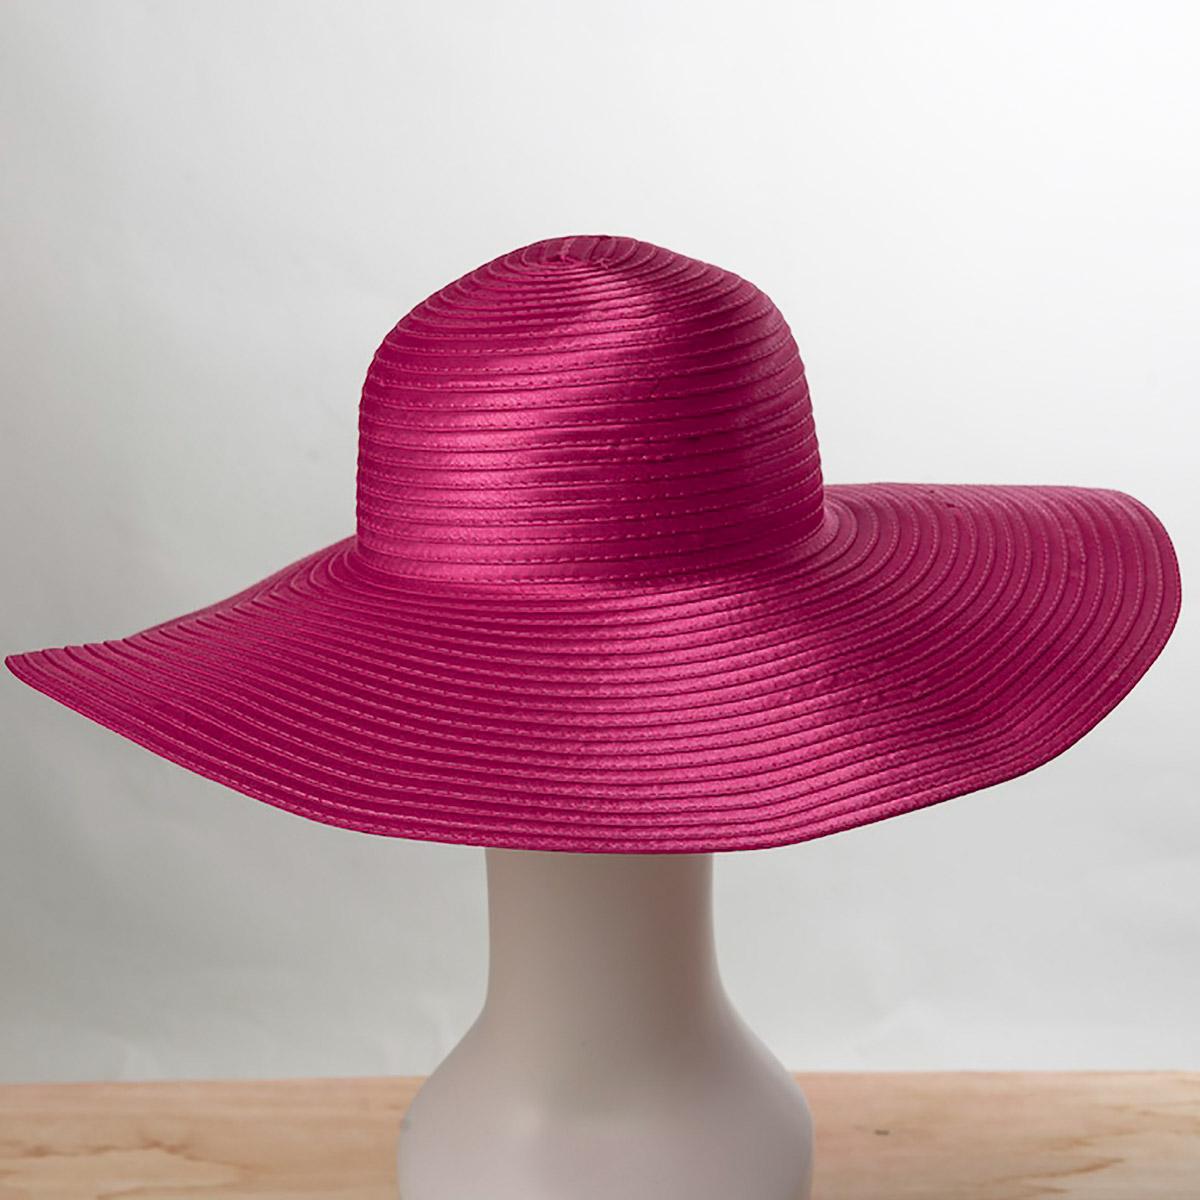 Fuchsia Satin Braid Swinger Hats 805106 Fu Sun Yorkos Zoria